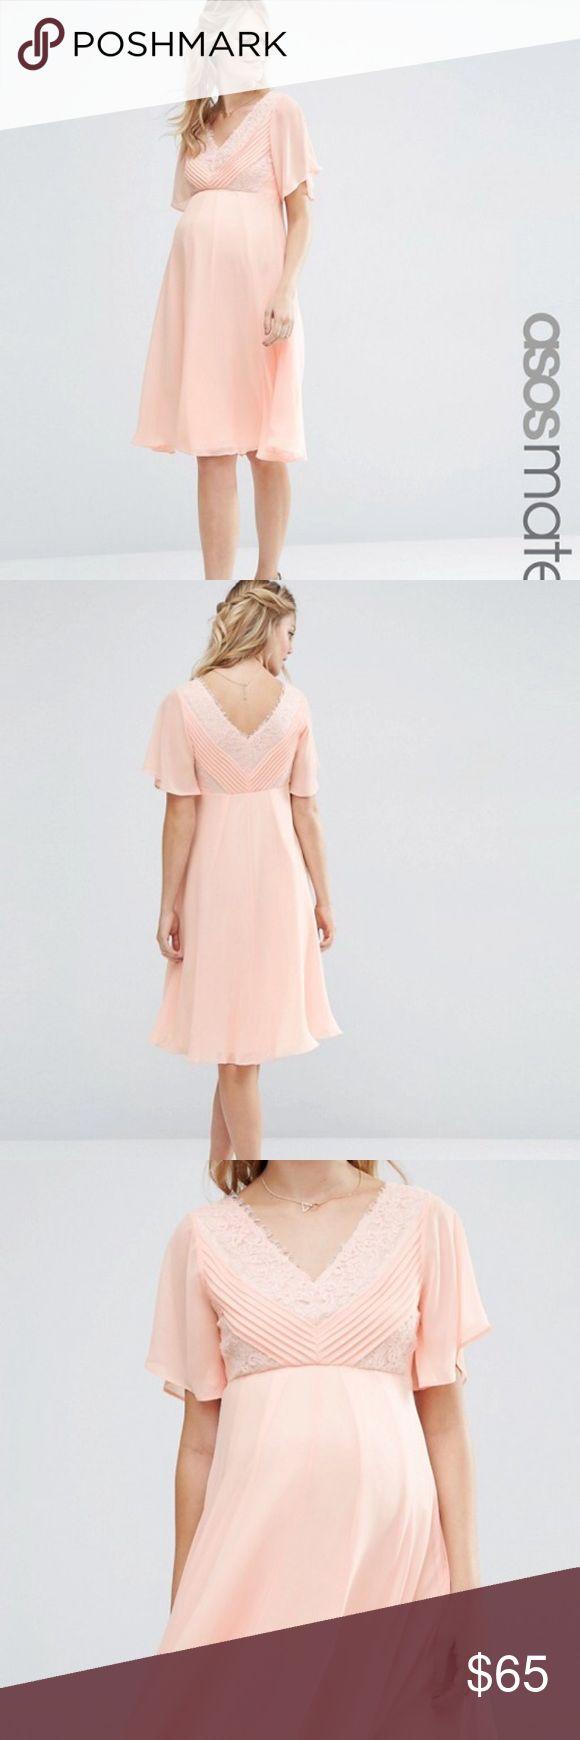 Asos maternity midi dress peachy pink color ASOS Maternity Dresses Midi